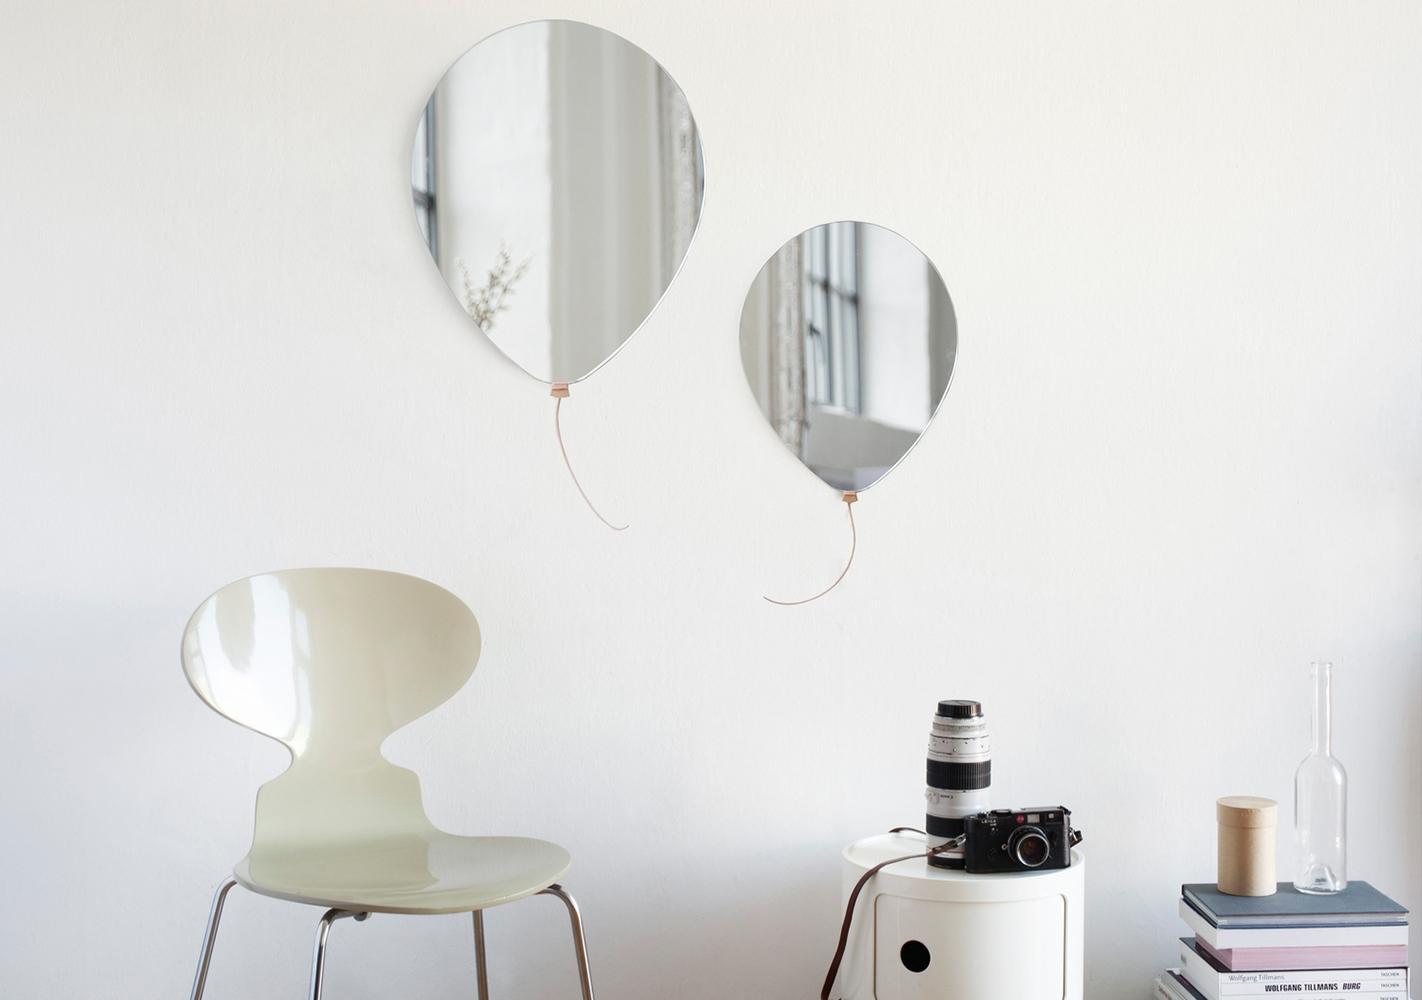 Miroir Ballon big - ELEMENTS OPTIMAL